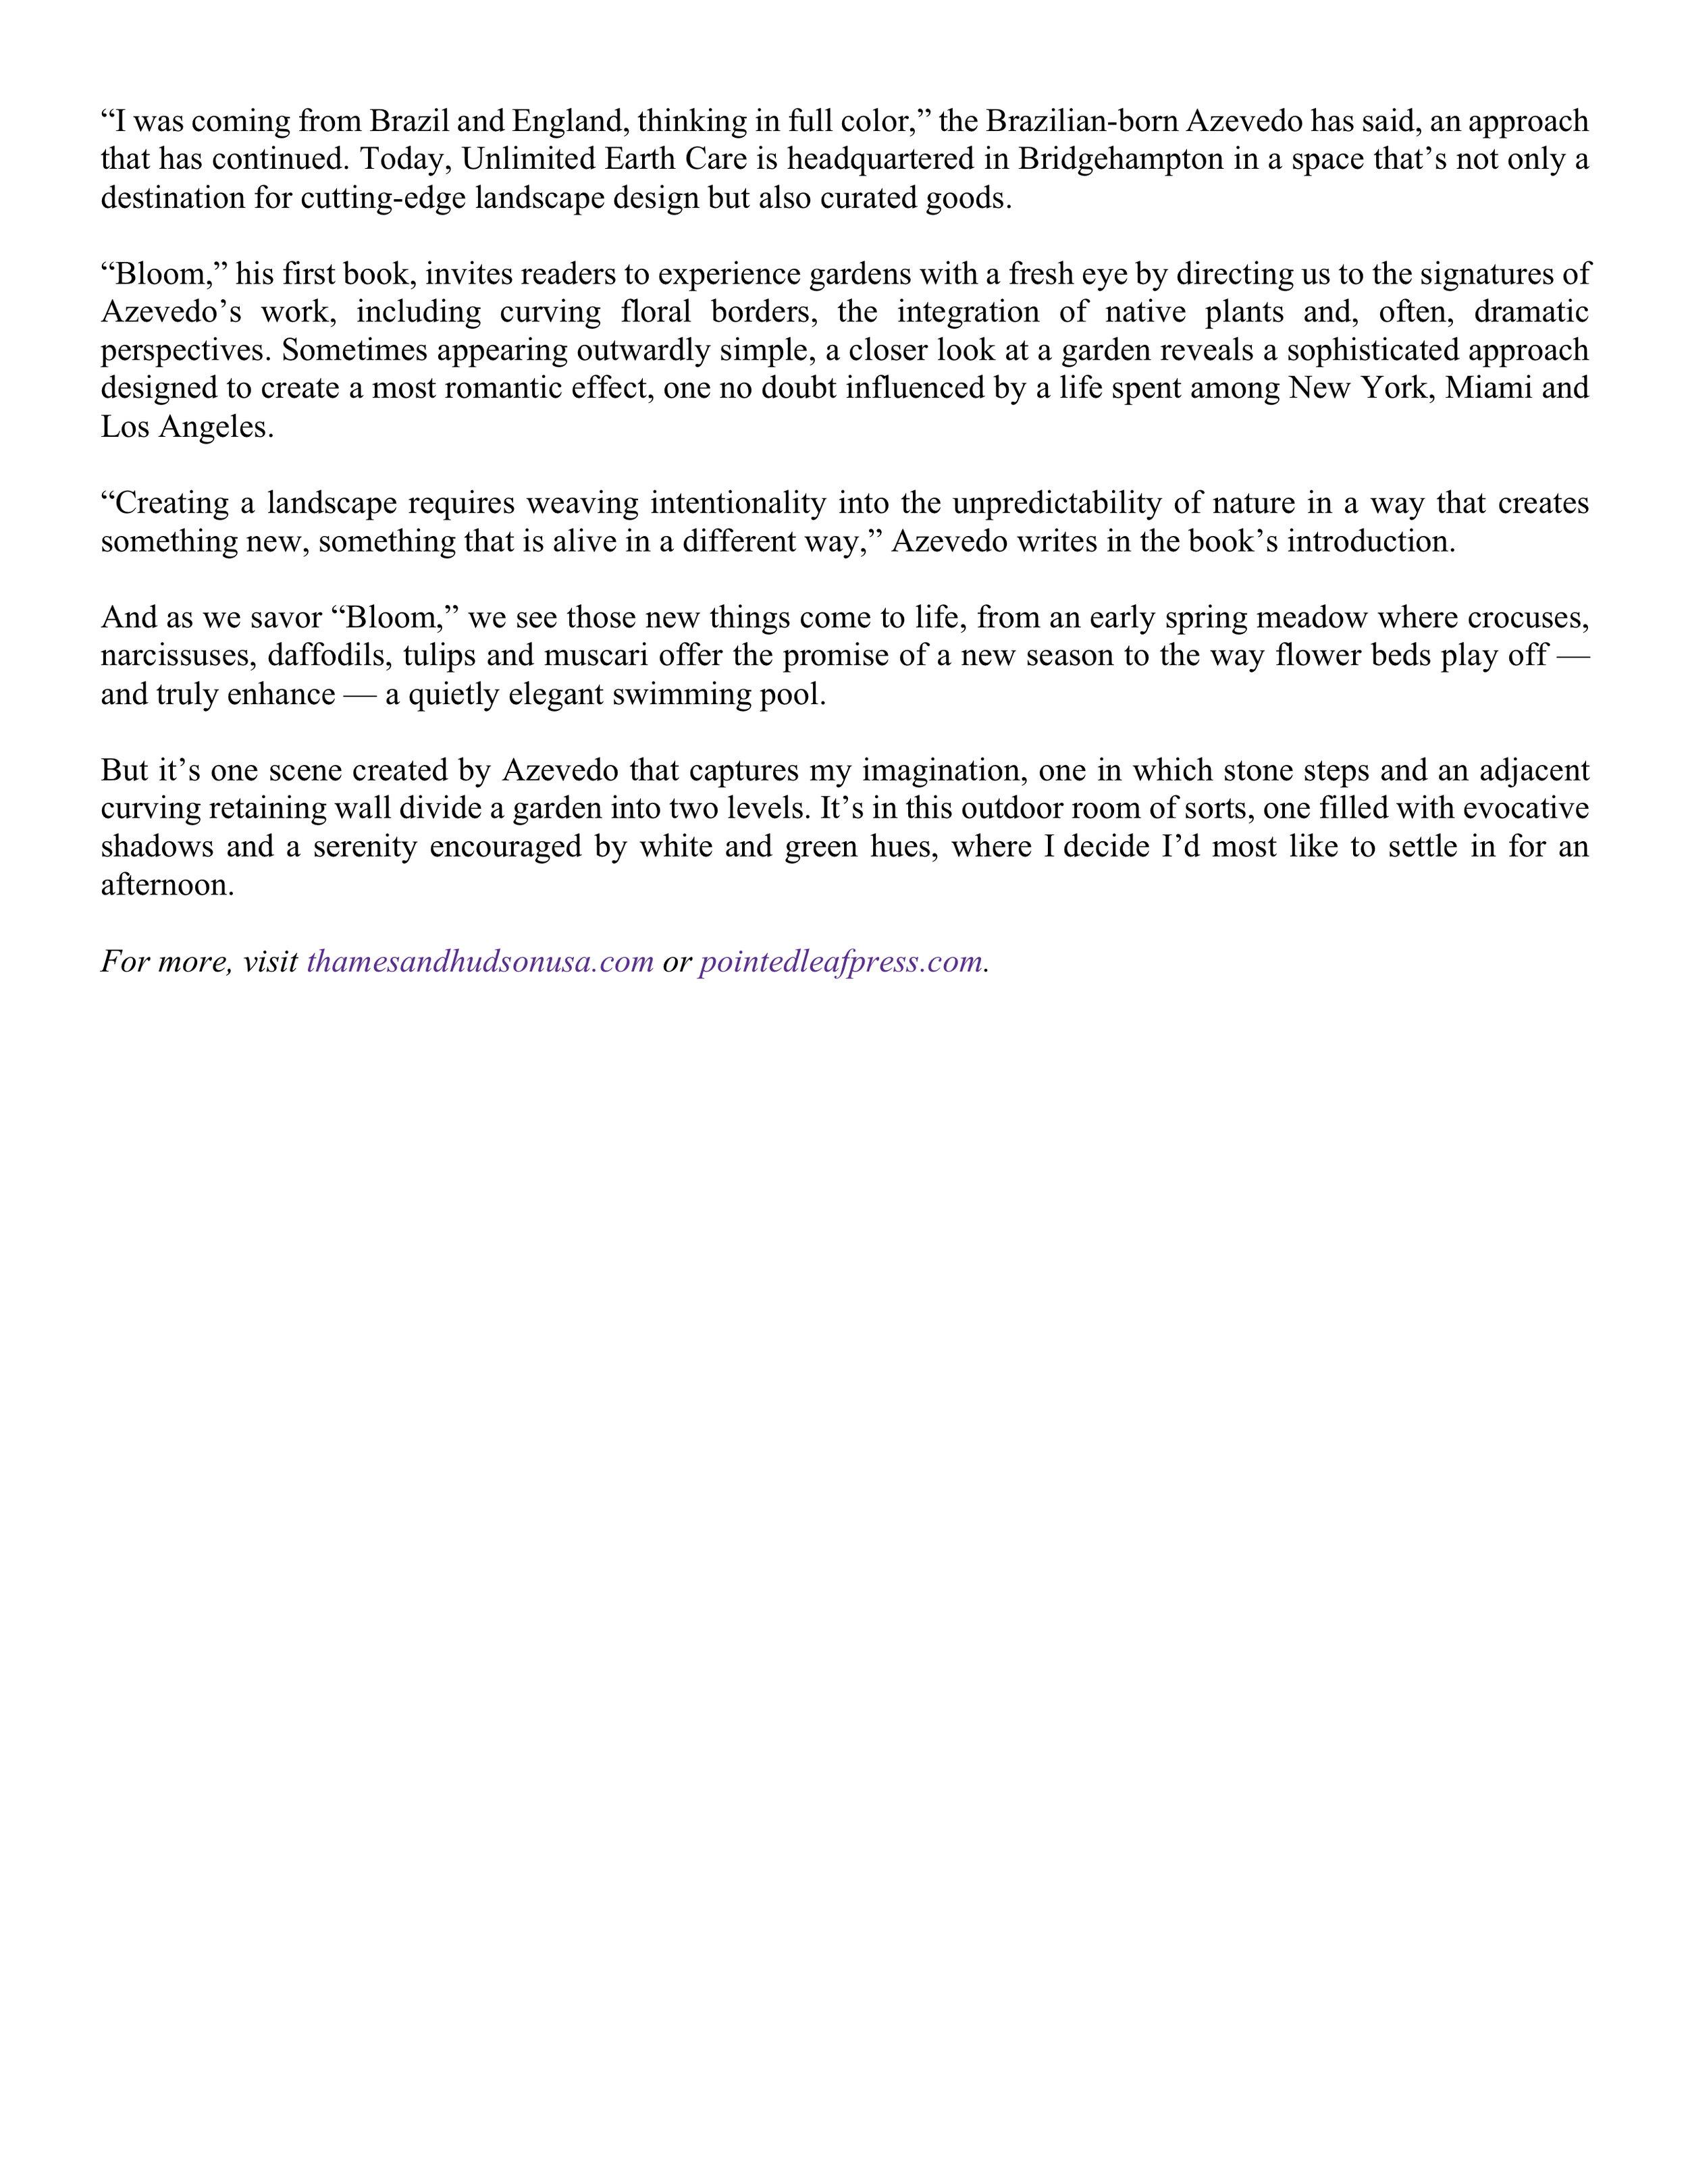 67 WAG - Petaling thru the pages - May 1_2019_pg3.jpg